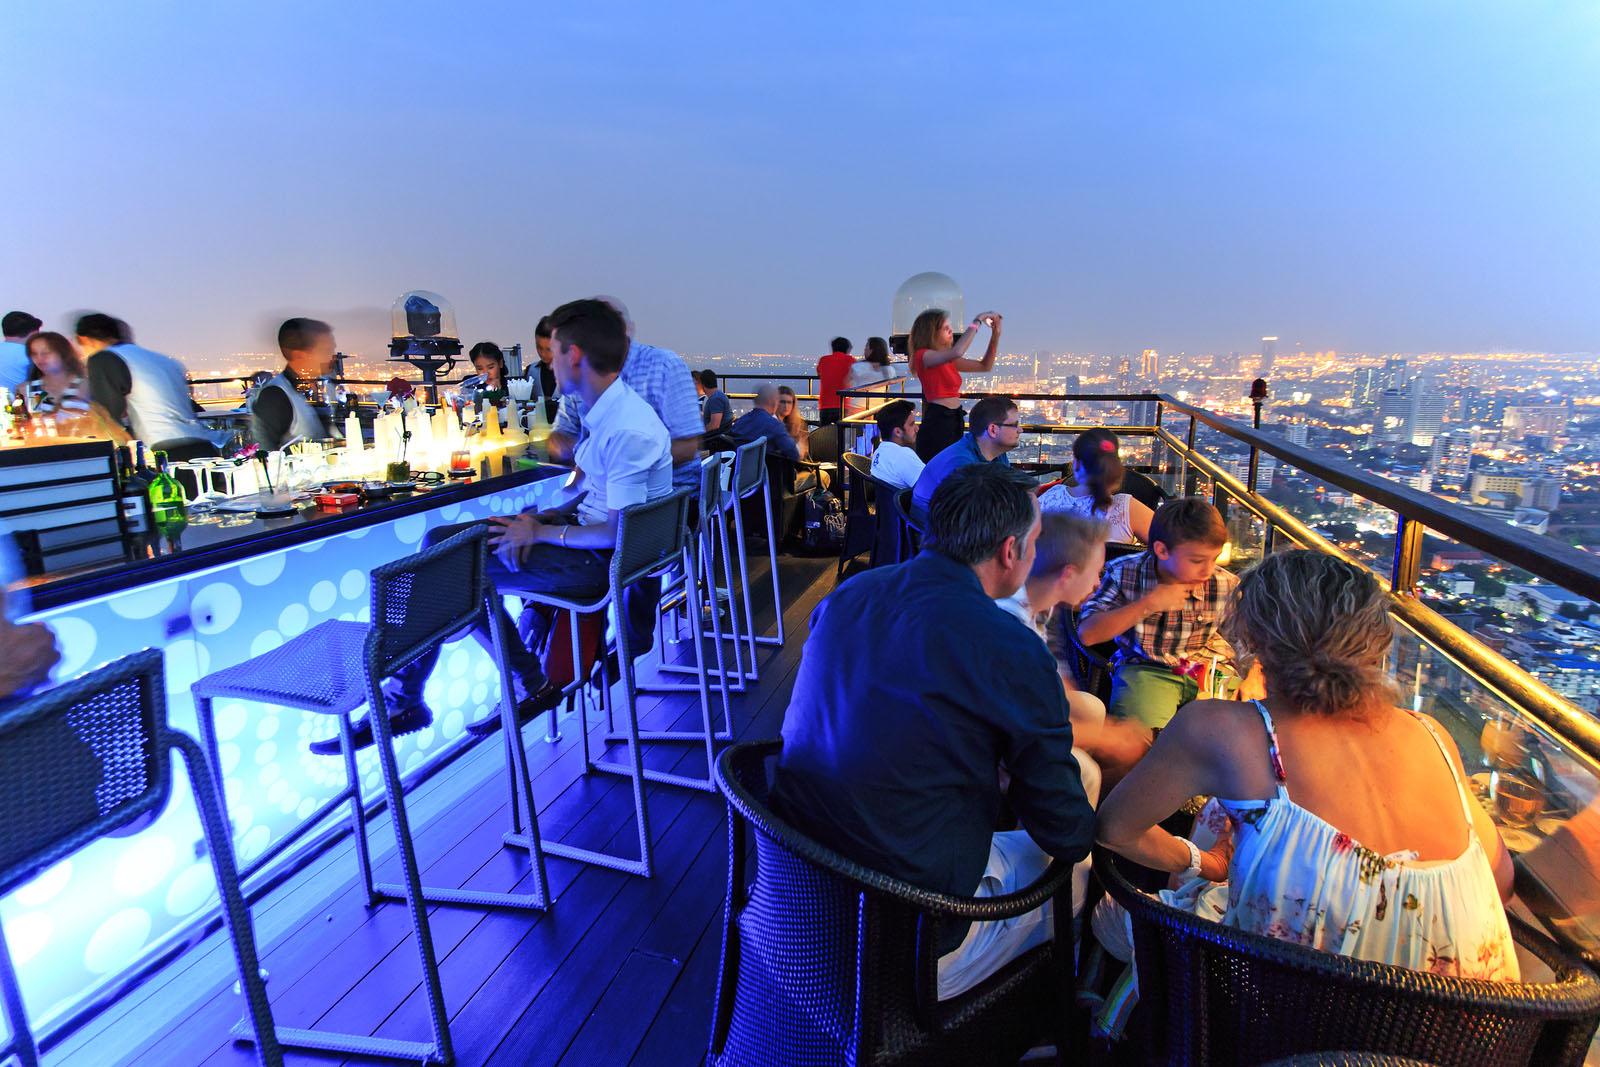 Hasil gambar untuk Lebua Sky Bar Thailand